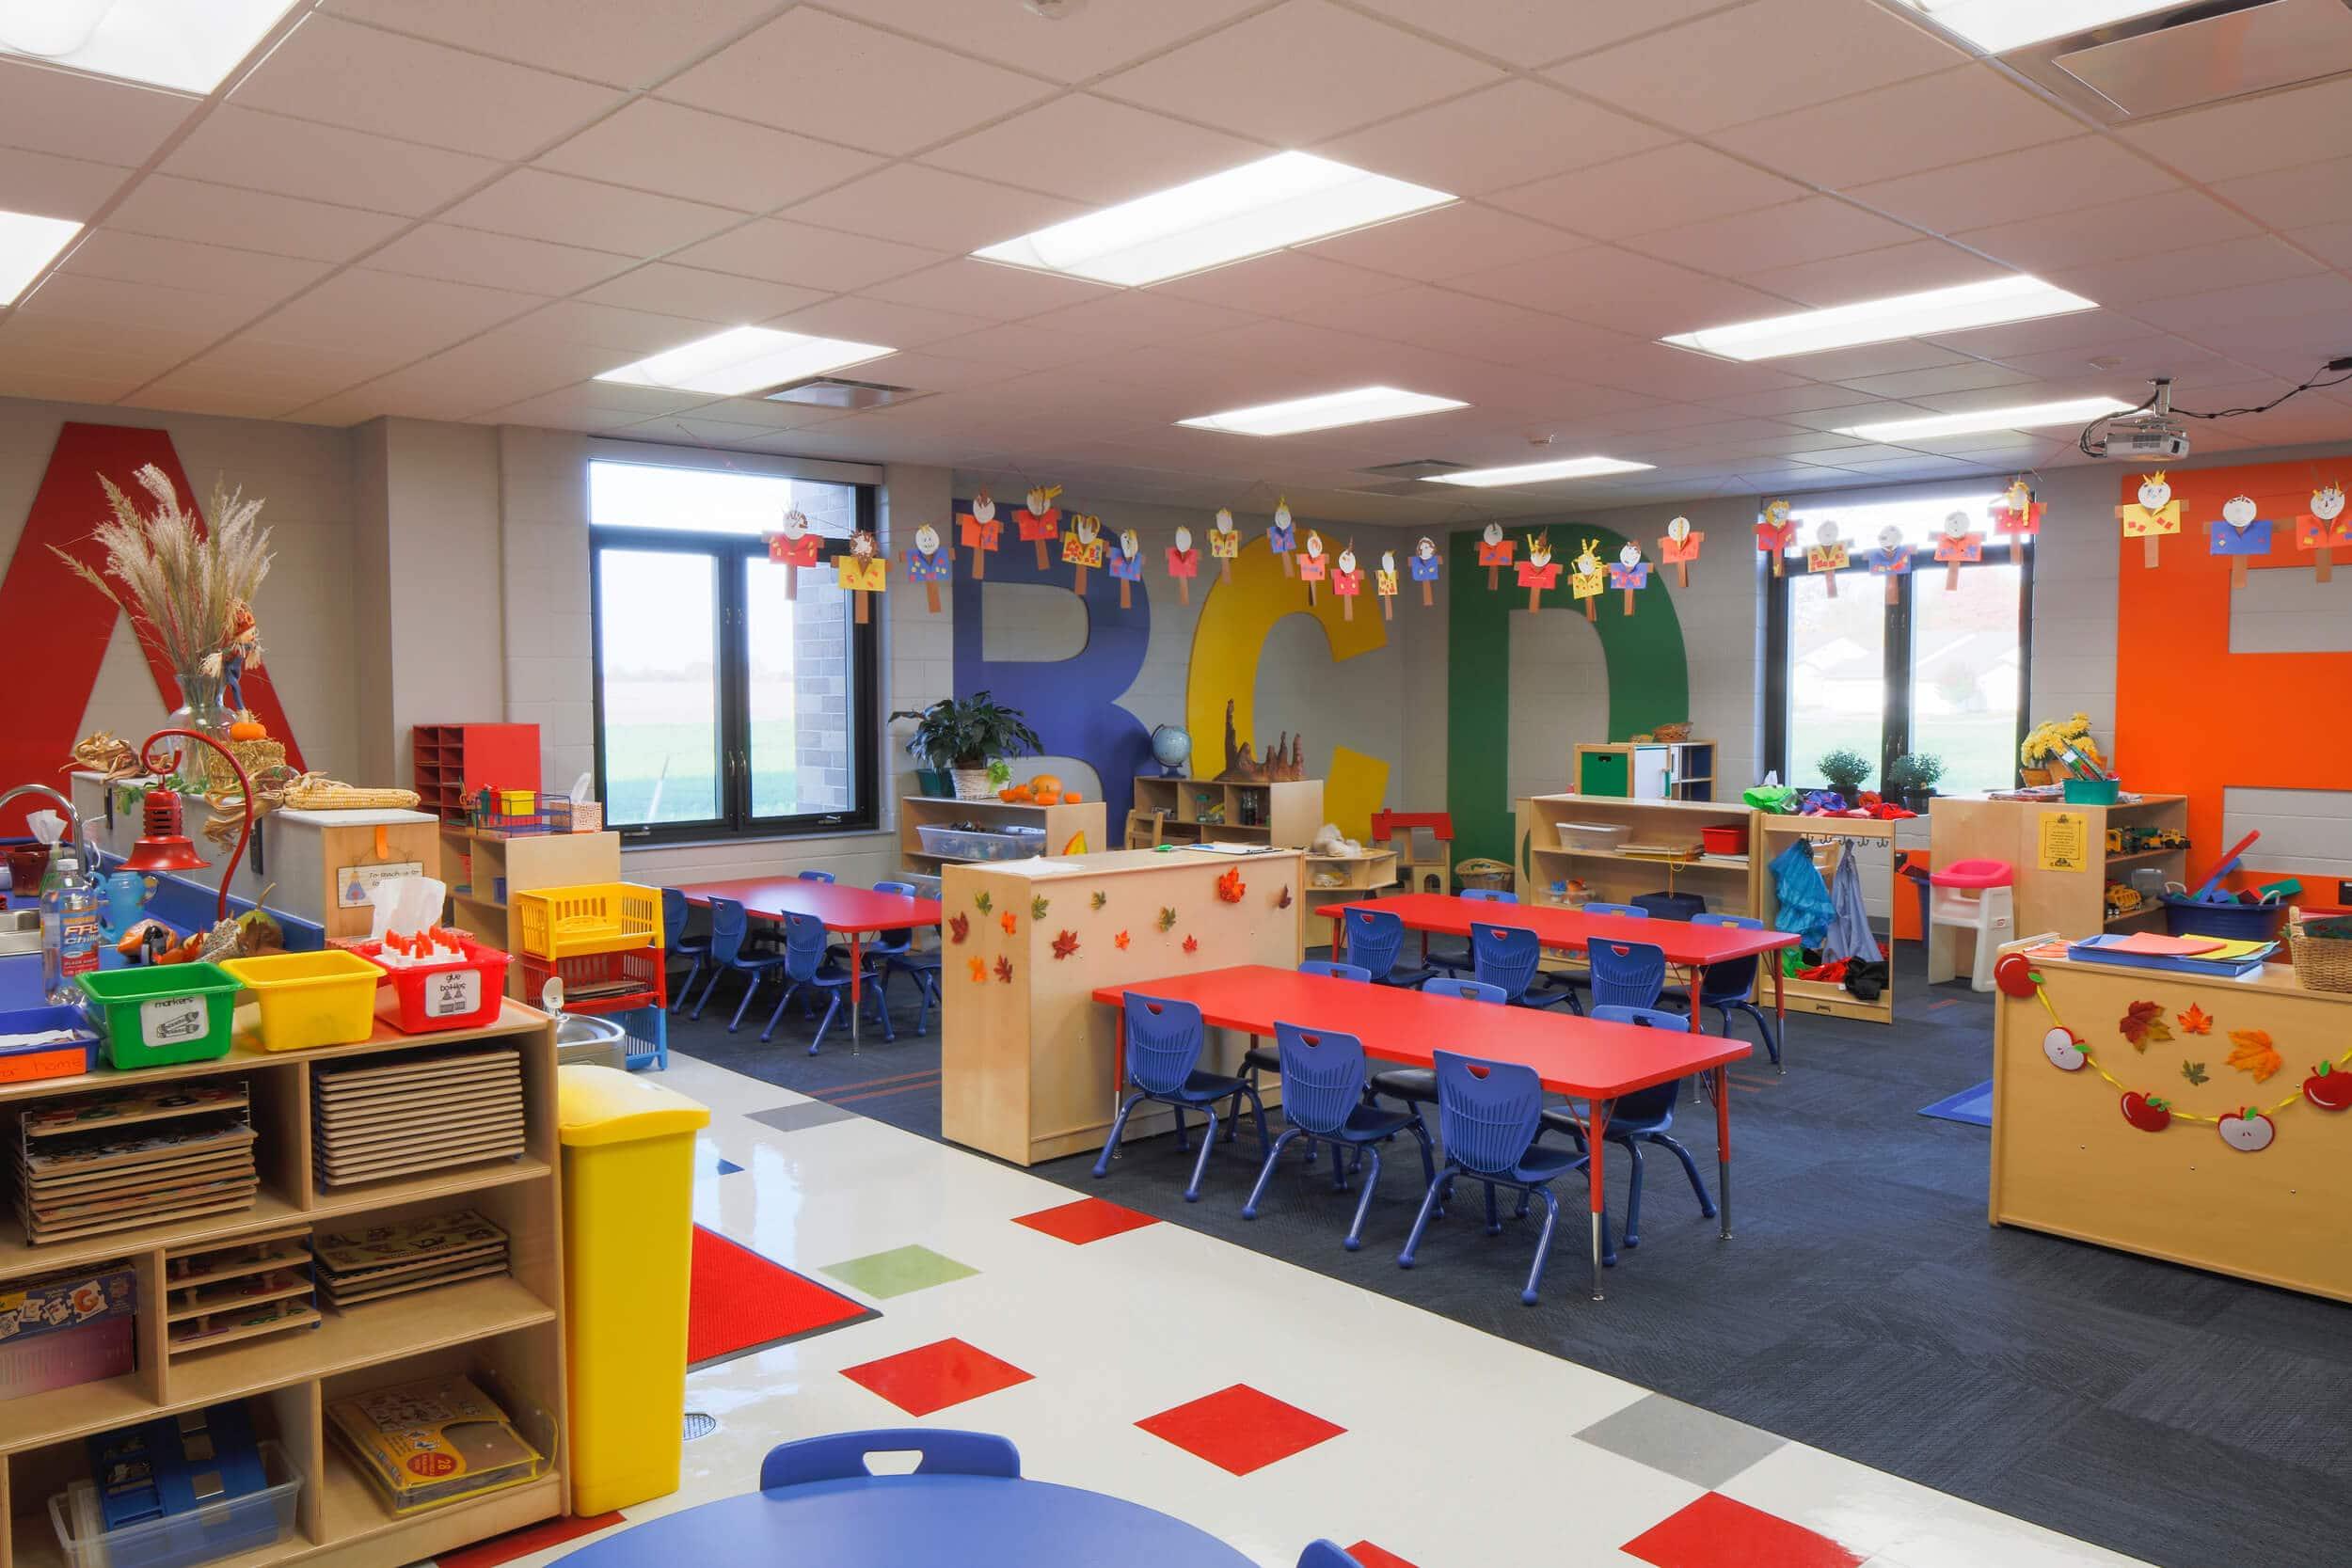 Roland_Story-Elementary-School-Addition-26